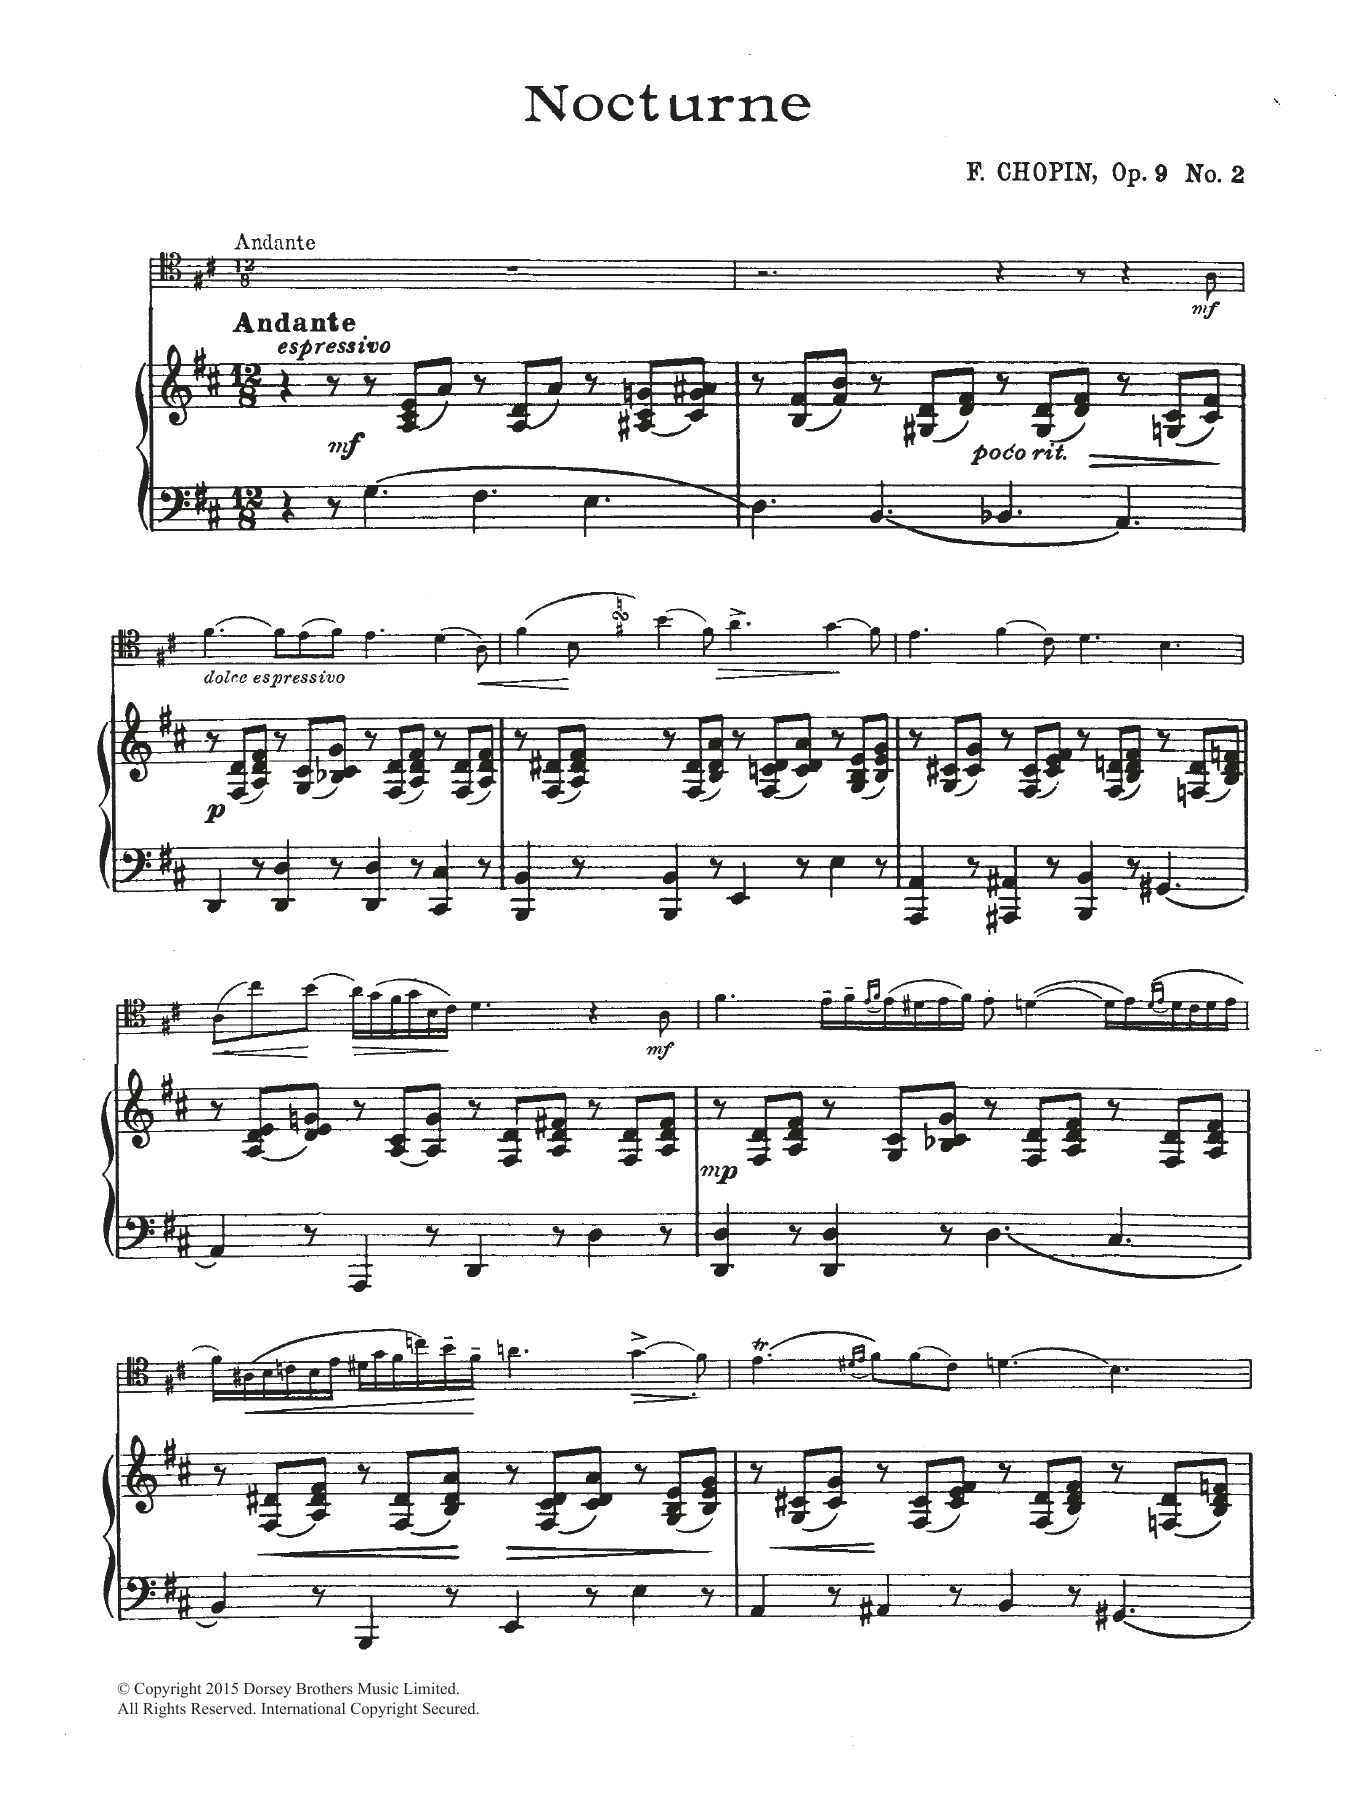 Nocturne in E Flat Major, Op.9, No.2 Sheet Music